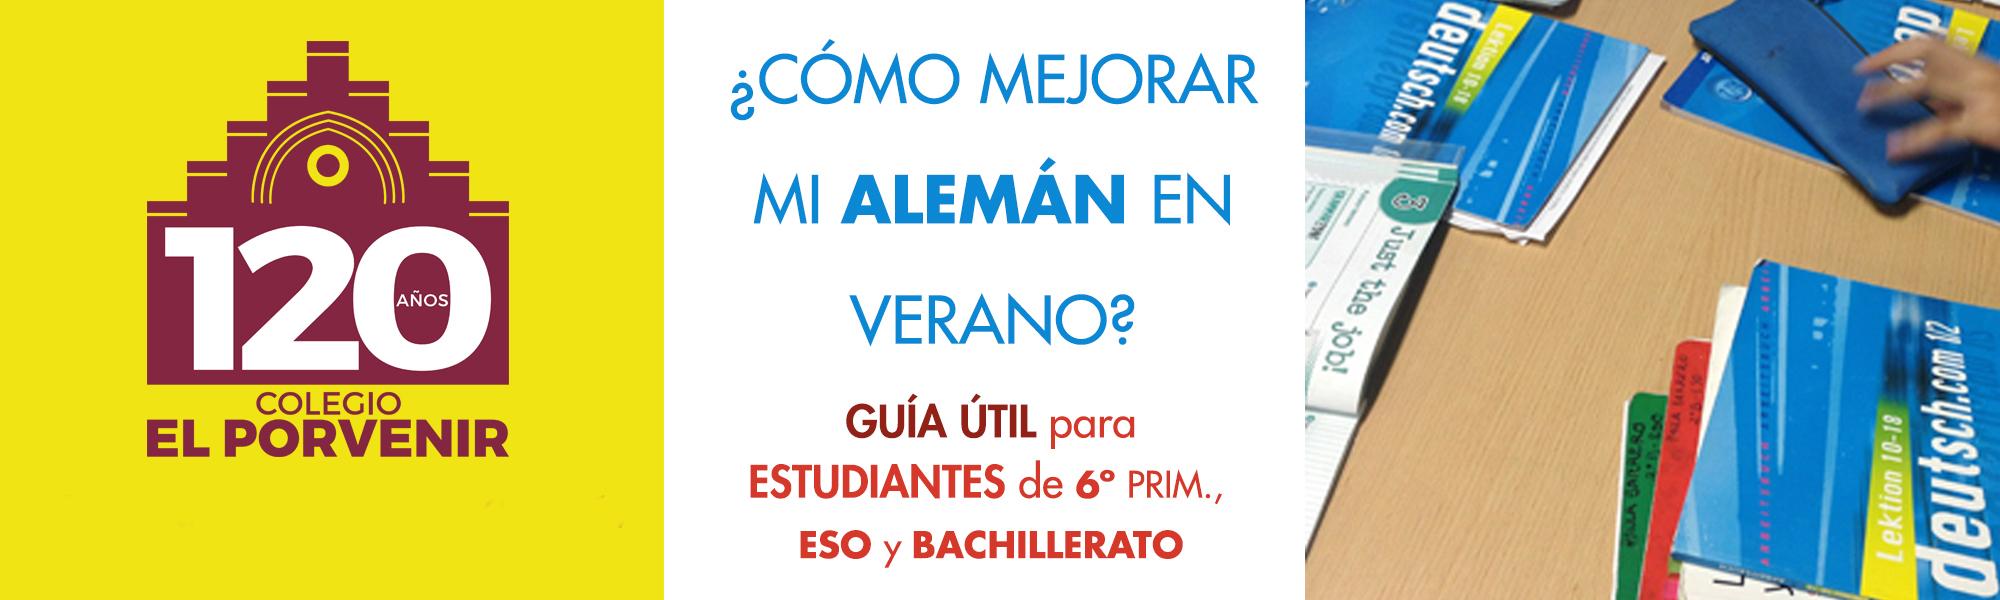 Guía útil para estudiantes de Alemán Primaria, Secundaria o ESO y Bachillerato